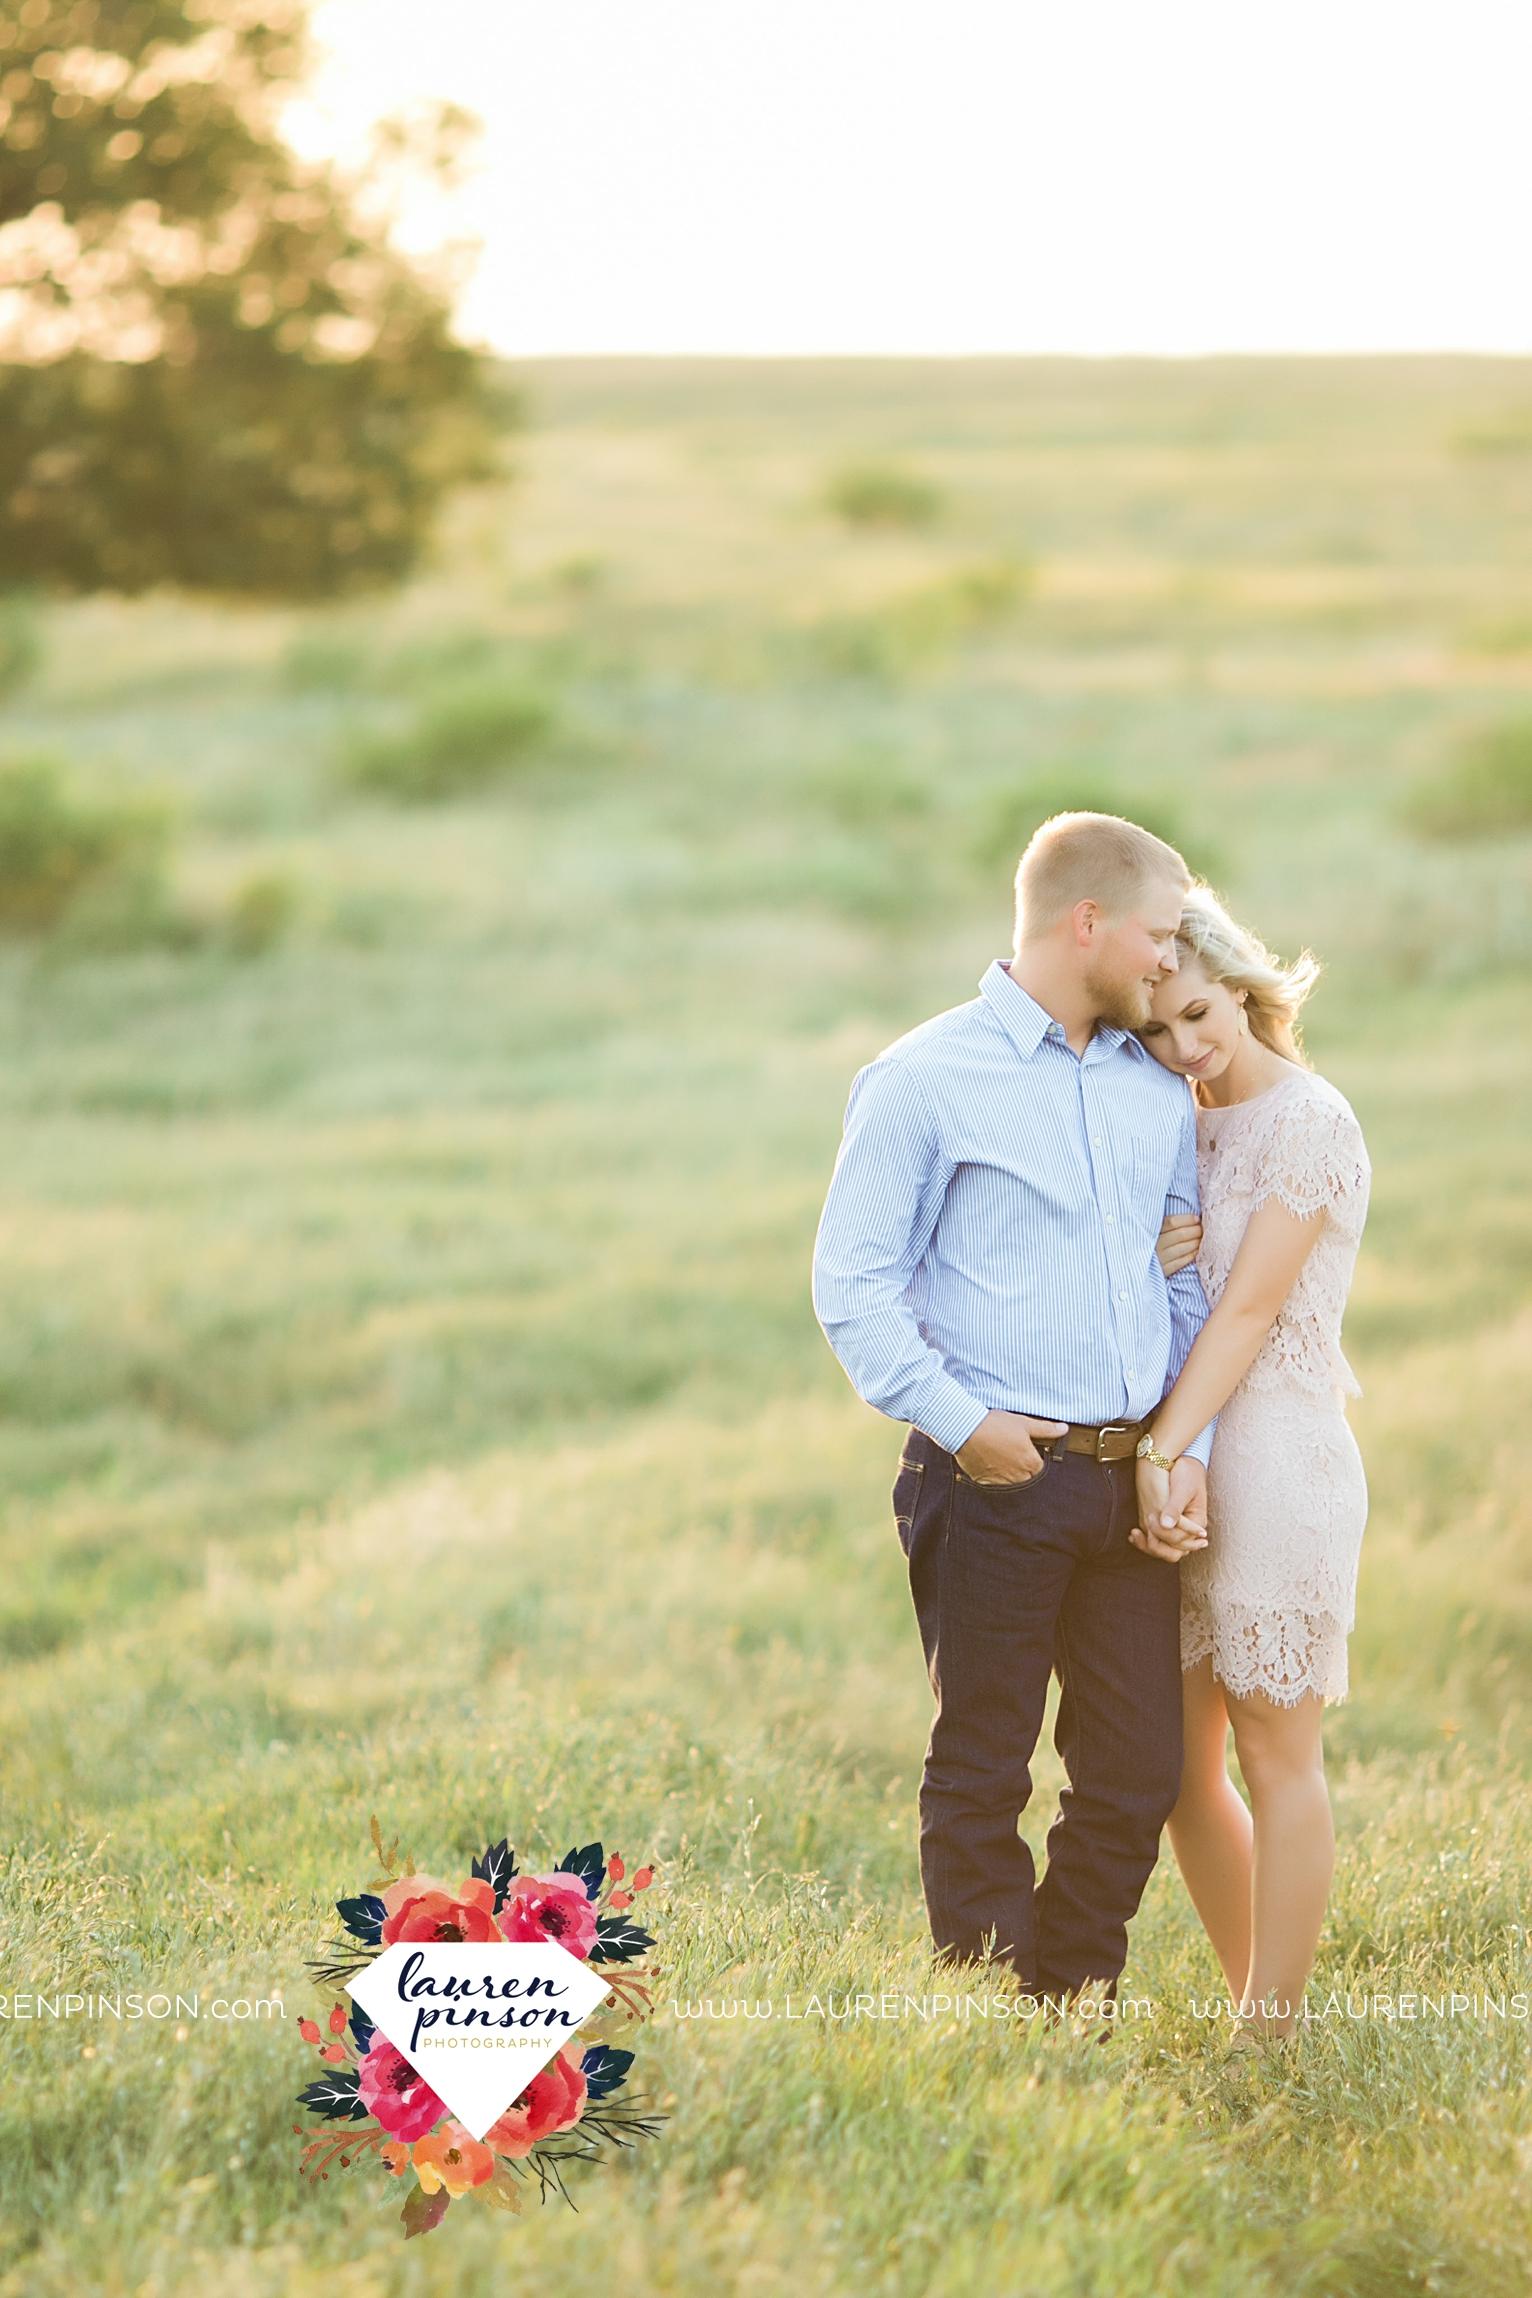 wichita-falls-texas-wedding-photographer-scotland-texas-engagement-session-country-barn-field-windthorst_2769.jpg